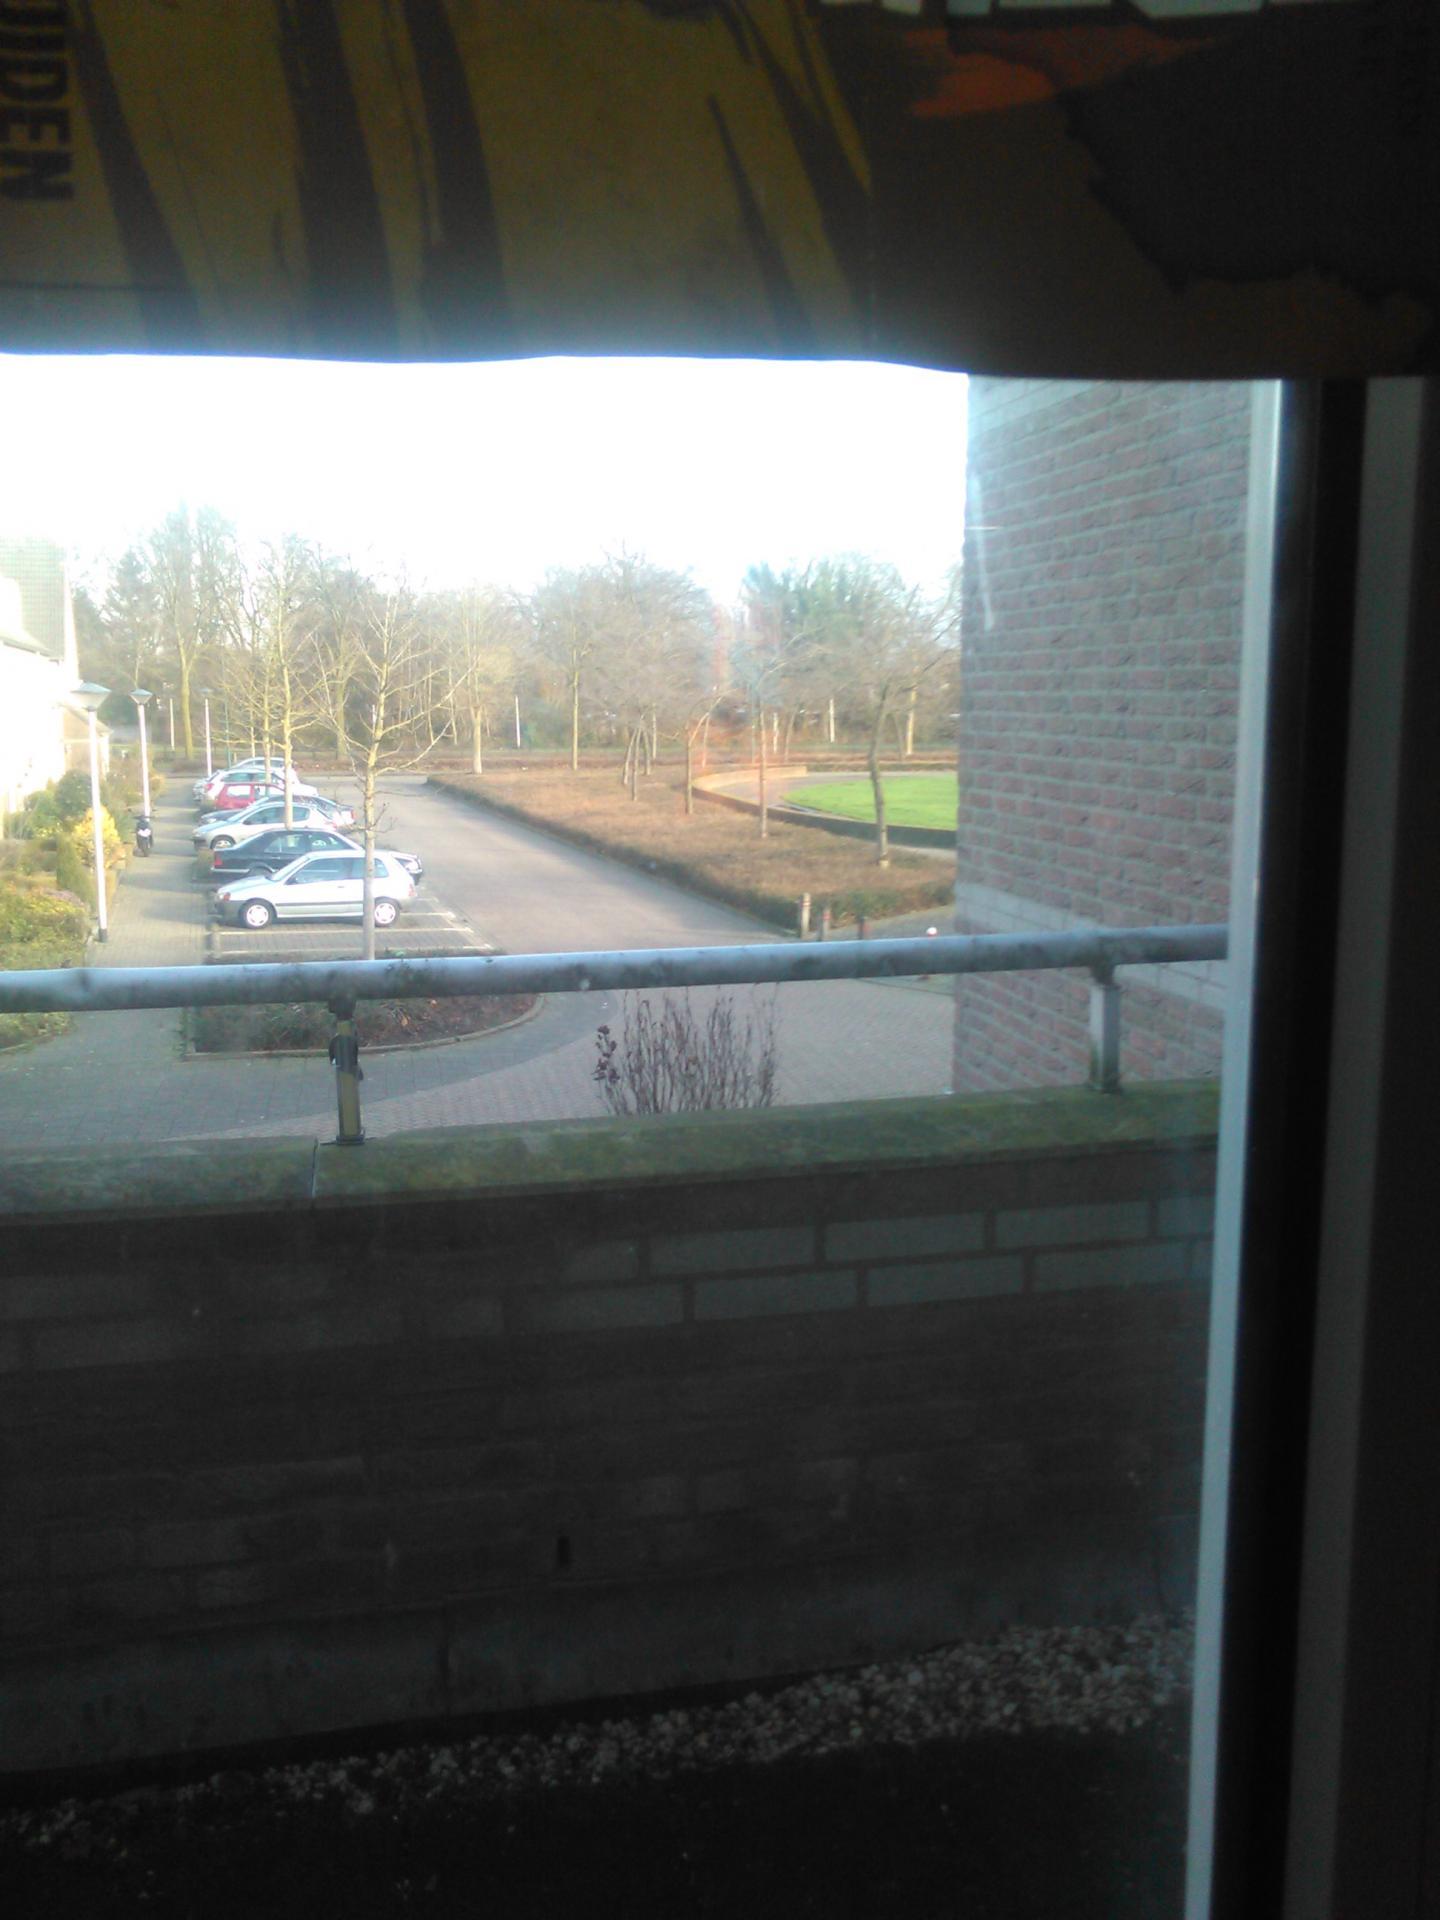 joeythout uit Noord-Brabant,Nederland